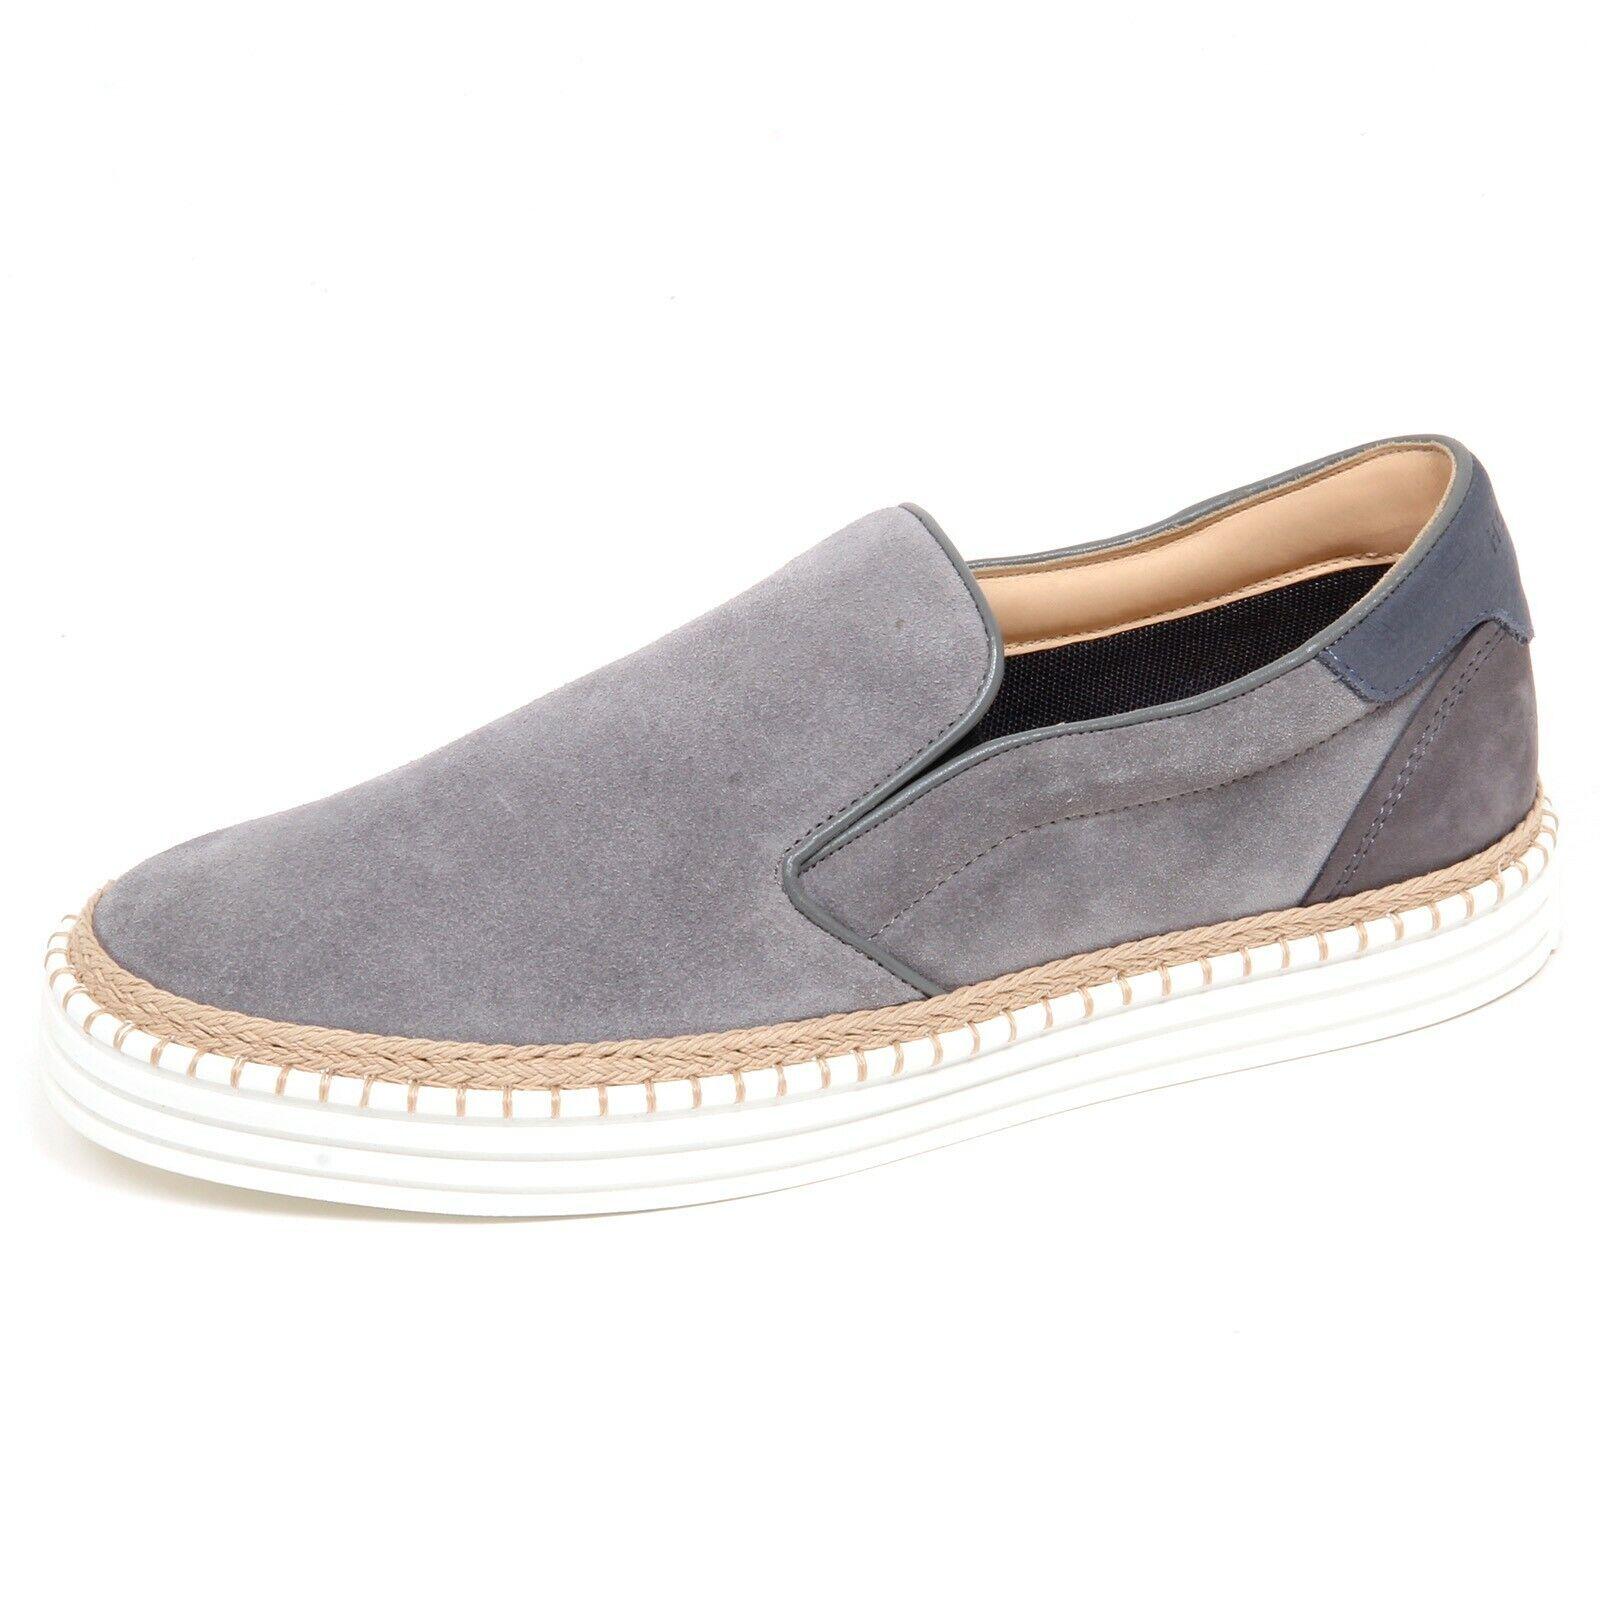 F6114 scarpe da ginnastica uomo grigio HOGAN R260 scarpe suede slip on scarpe man